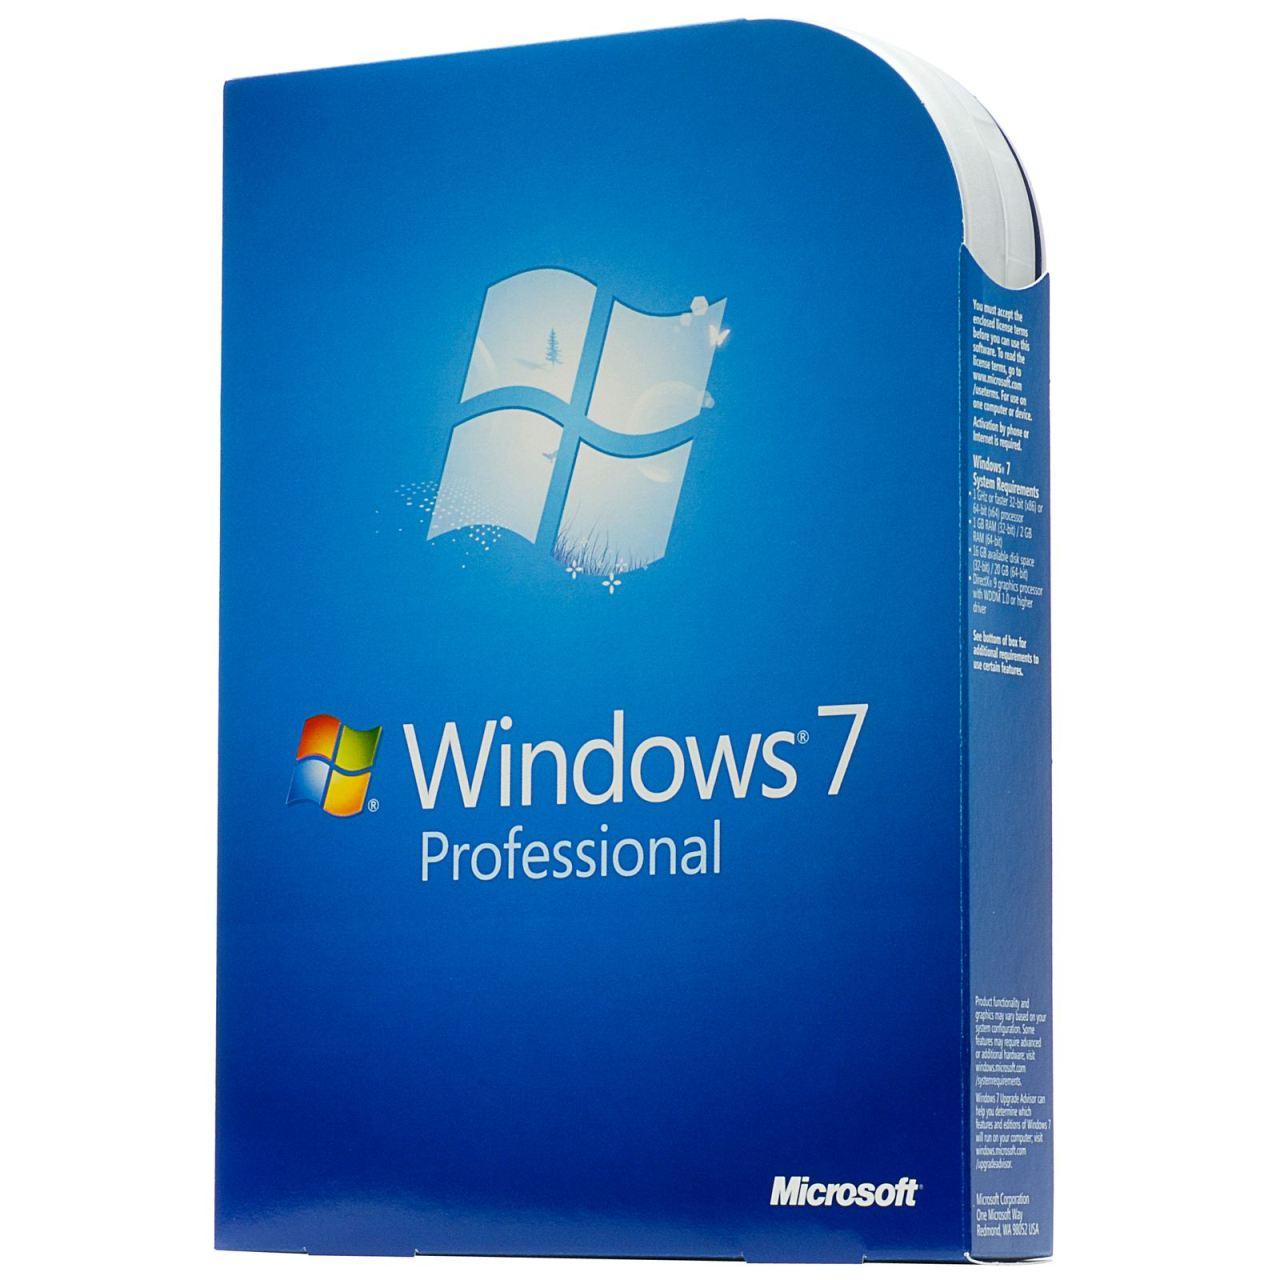 windows 7 home professional keys kaufen mykey software. Black Bedroom Furniture Sets. Home Design Ideas